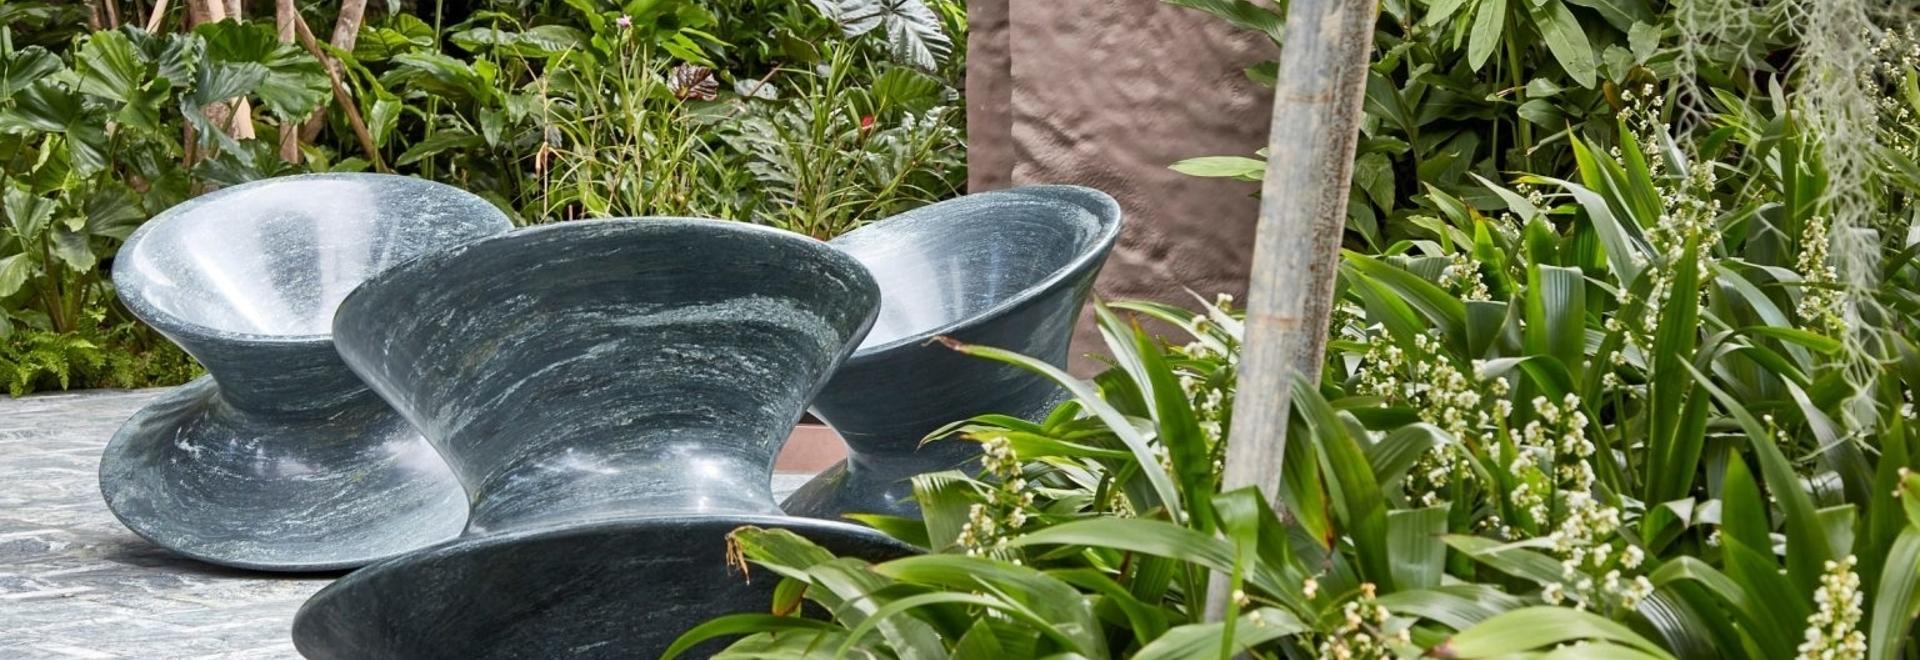 Le studio Heatherwick recrée la chaise Spun en granit